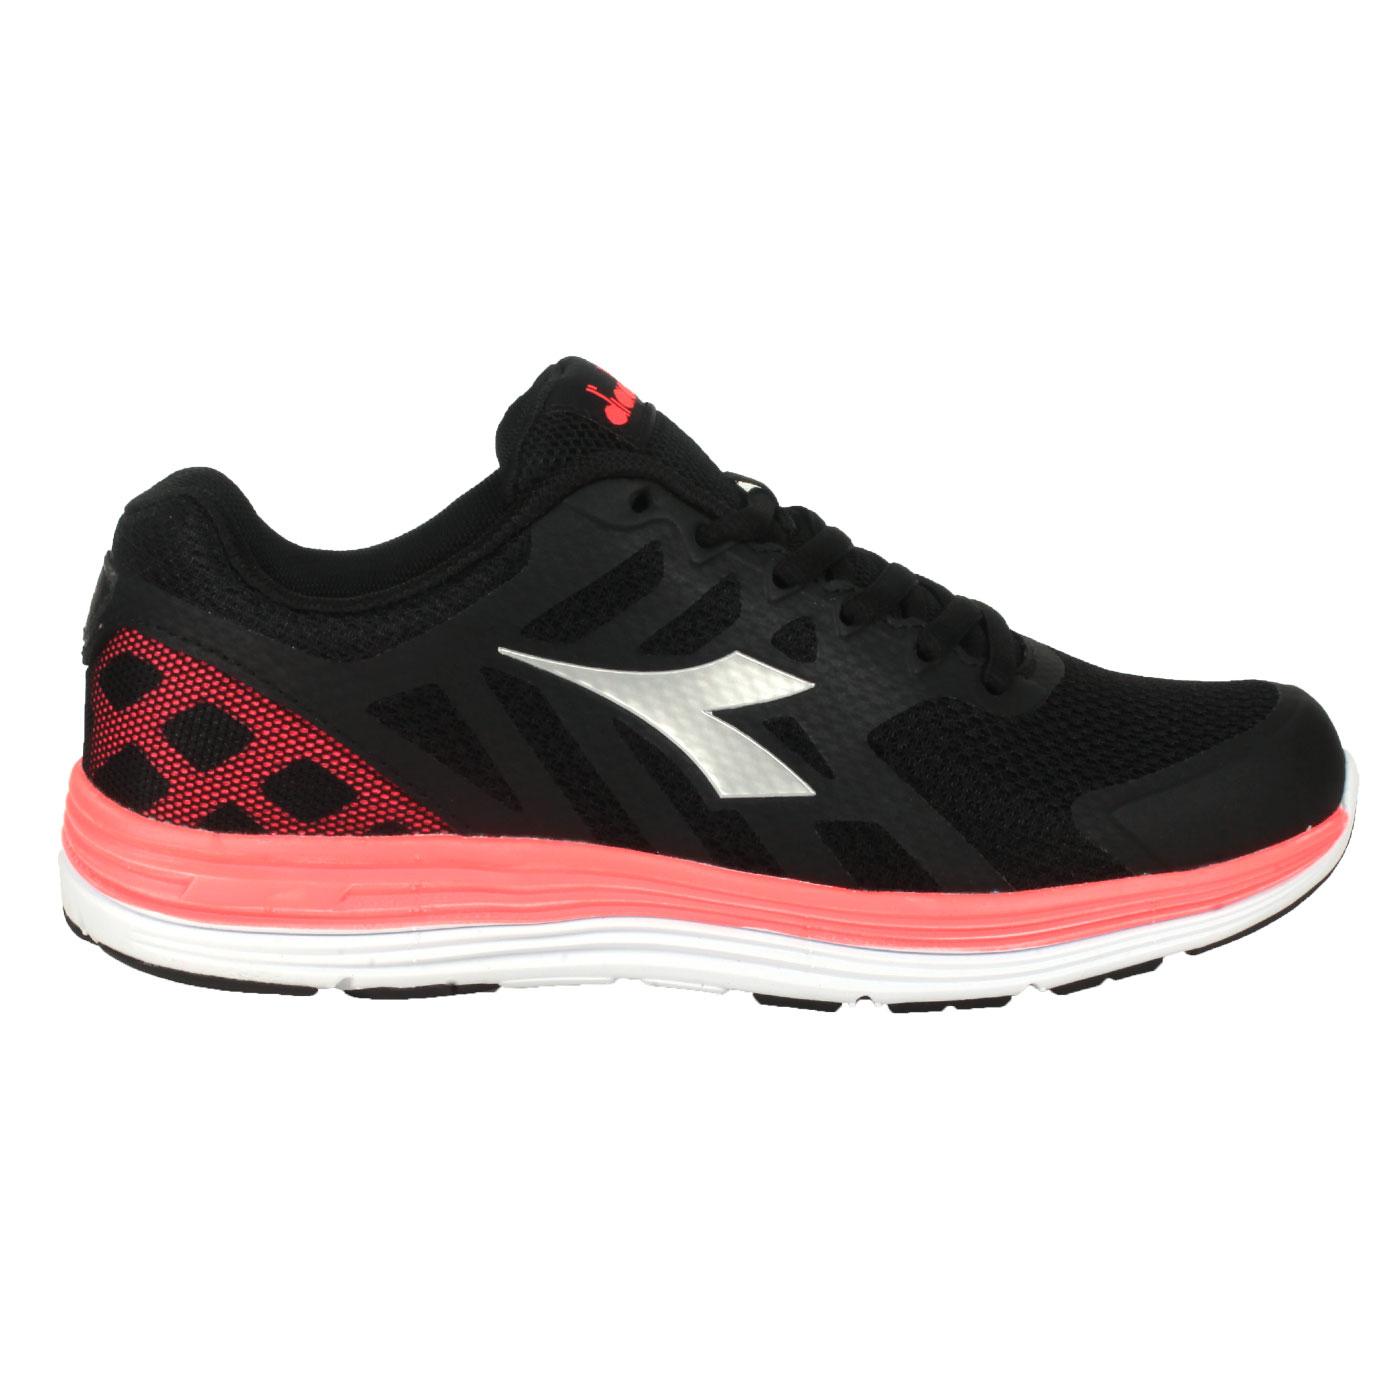 DIADORA 女款專業輕量慢跑鞋 DA31633 - 黑銀螢光粉